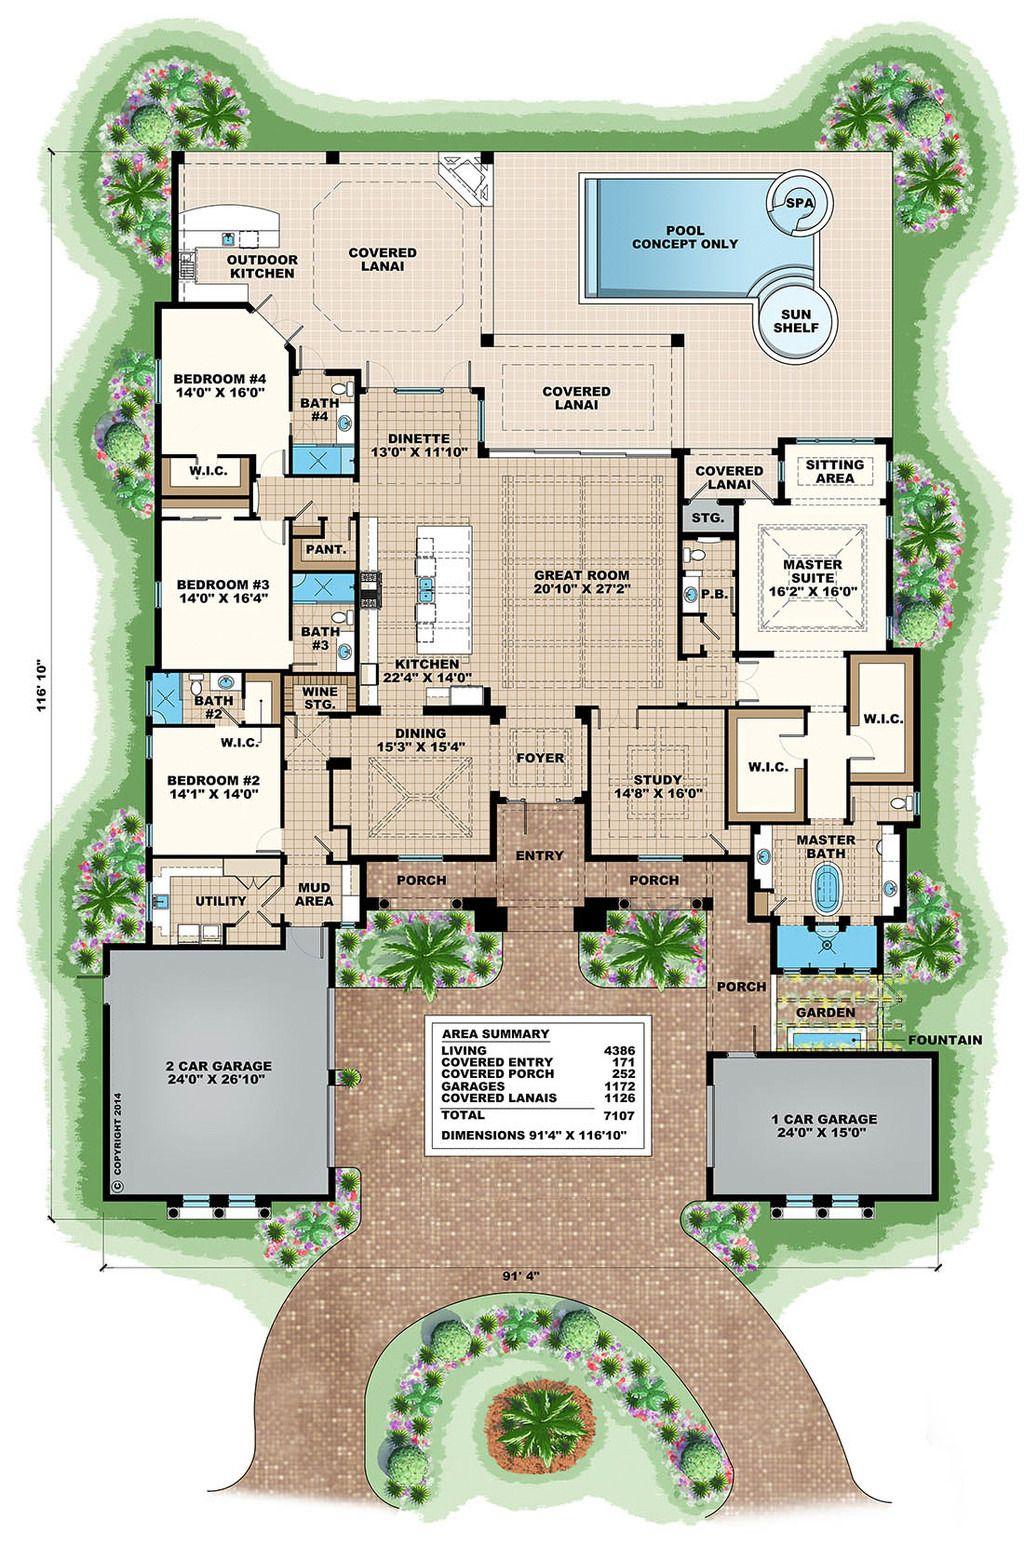 Mediterranean Style House Plan 4 Beds 4 50 Baths 7107 Sq Ft Plan 27 502 Mediterranean Floor Plans Mediterranean Style House Plans Mediterranean House Plans